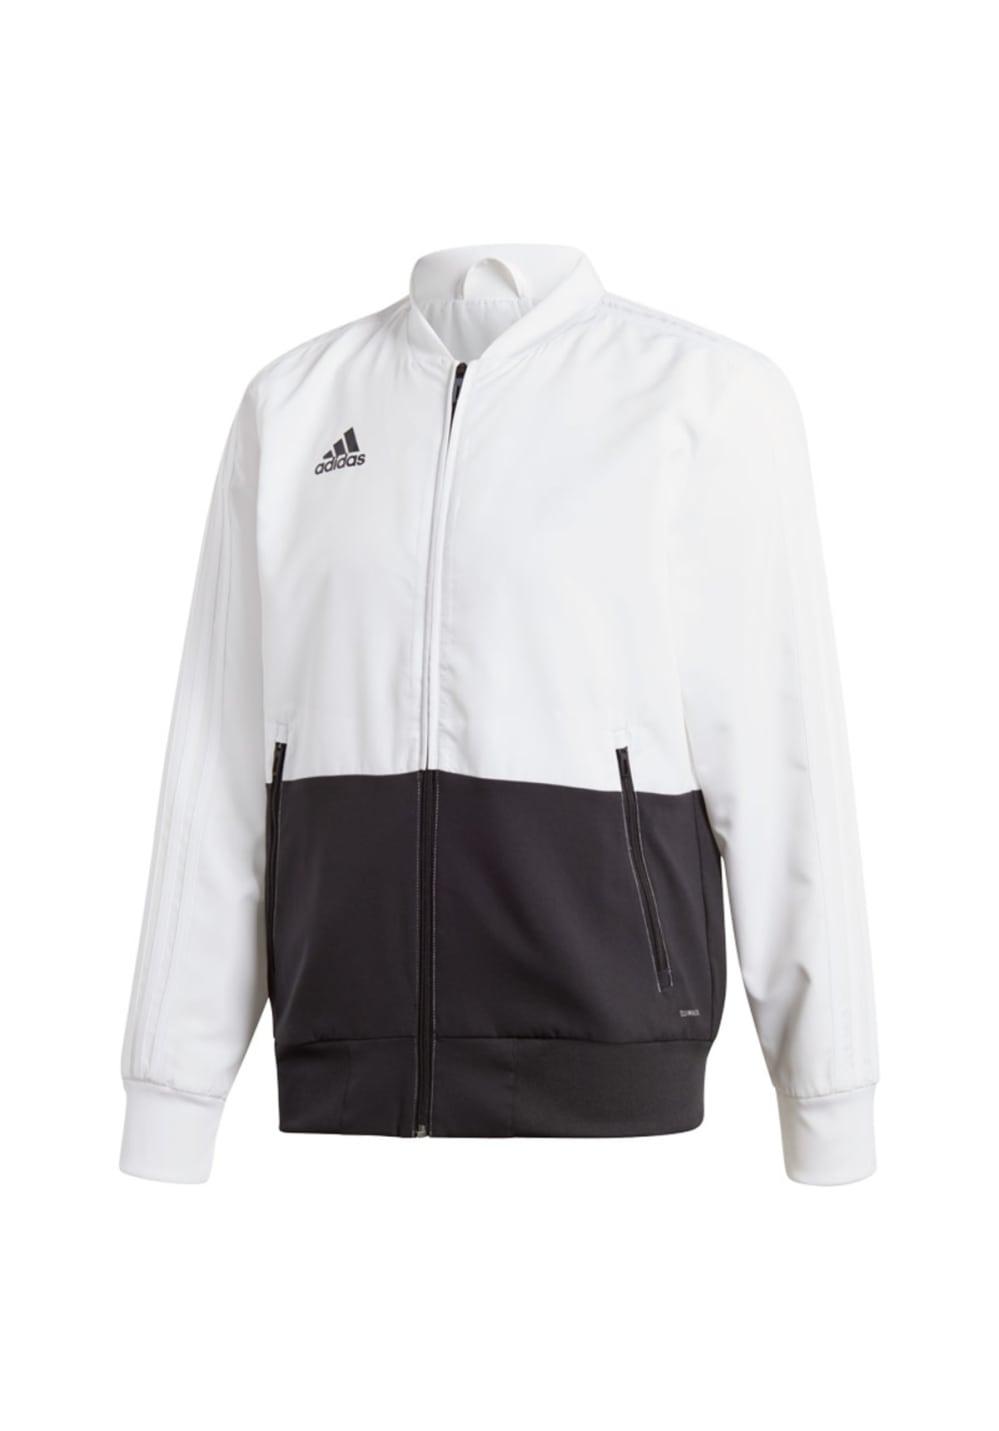 4ba8b7f6f7368 adidas-condivo-18-praesentationsjacke-running-jackets-men-white -pid-0002000434002.jpg